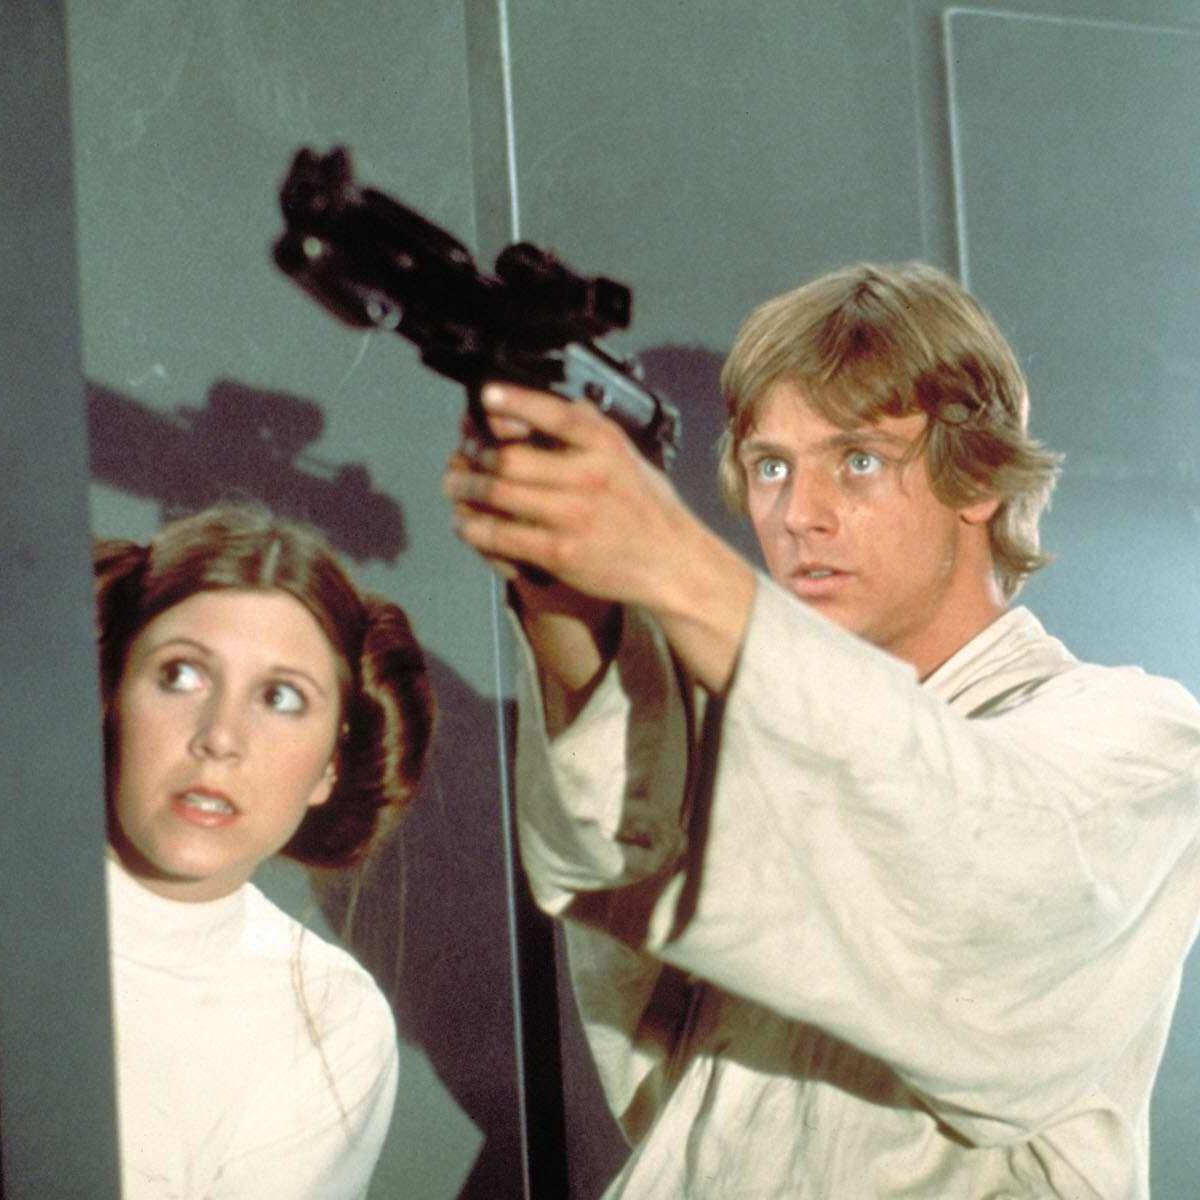 Luke Skywalker and Leia Organa, Star Wars: A New Hope